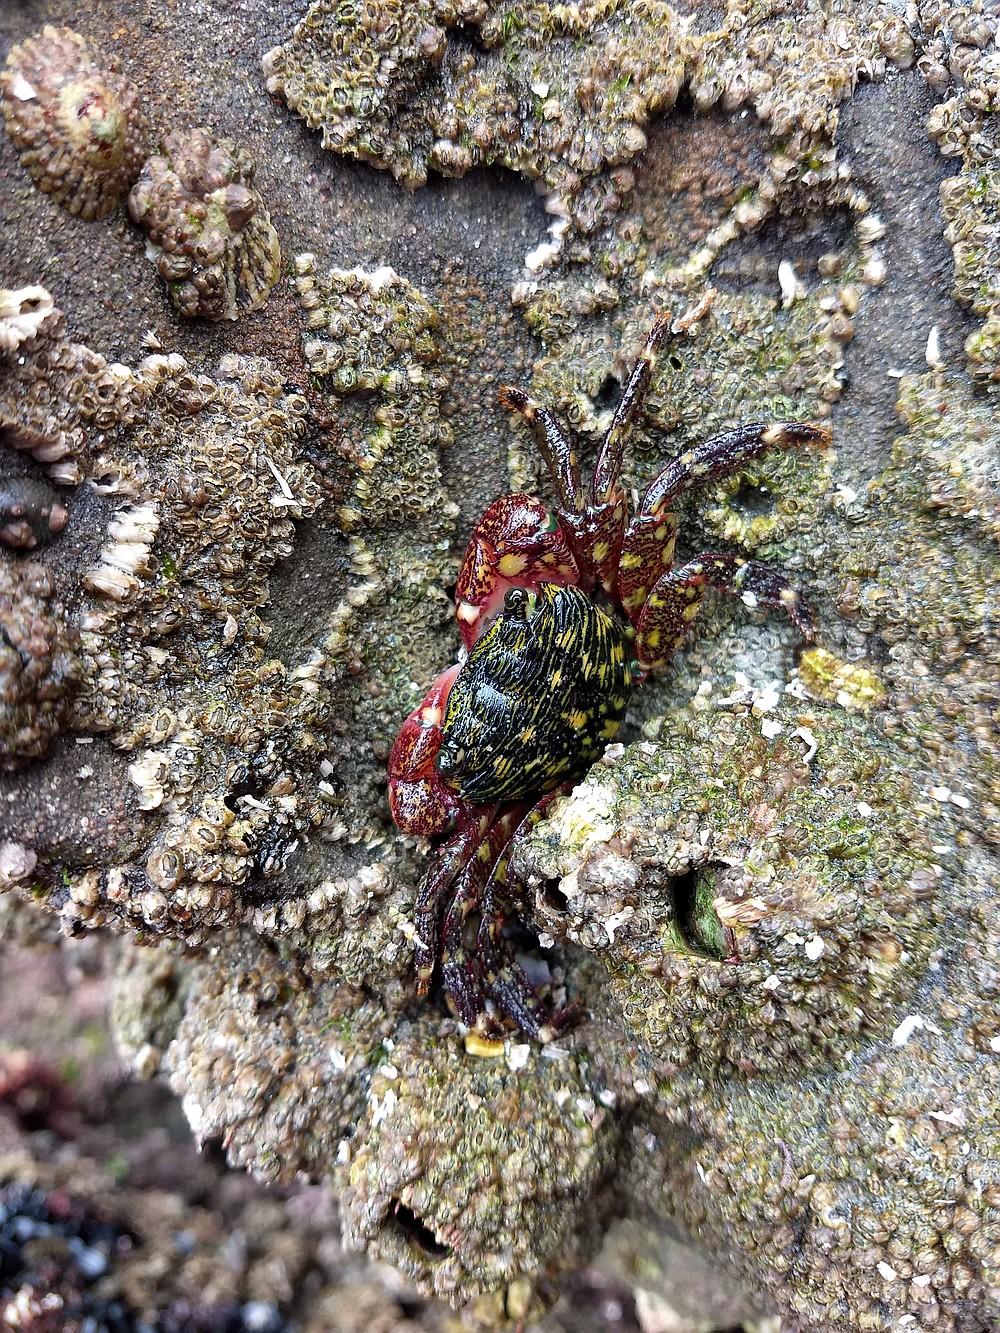 Striped shore crab at a tide pool near Dike Rock in La Jolla